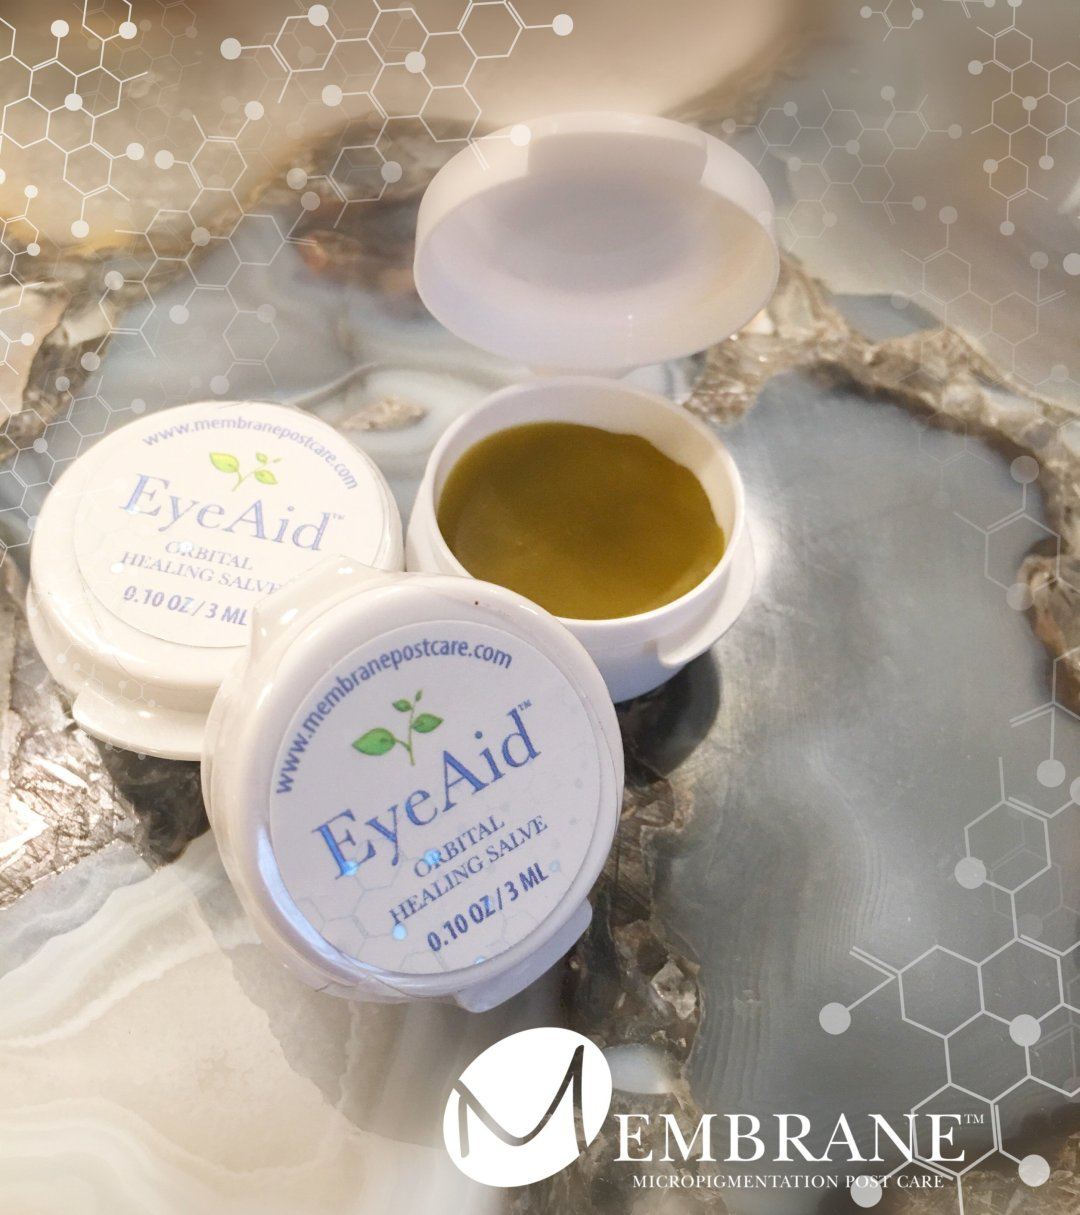 Membrane EyeAid MBCMEA02